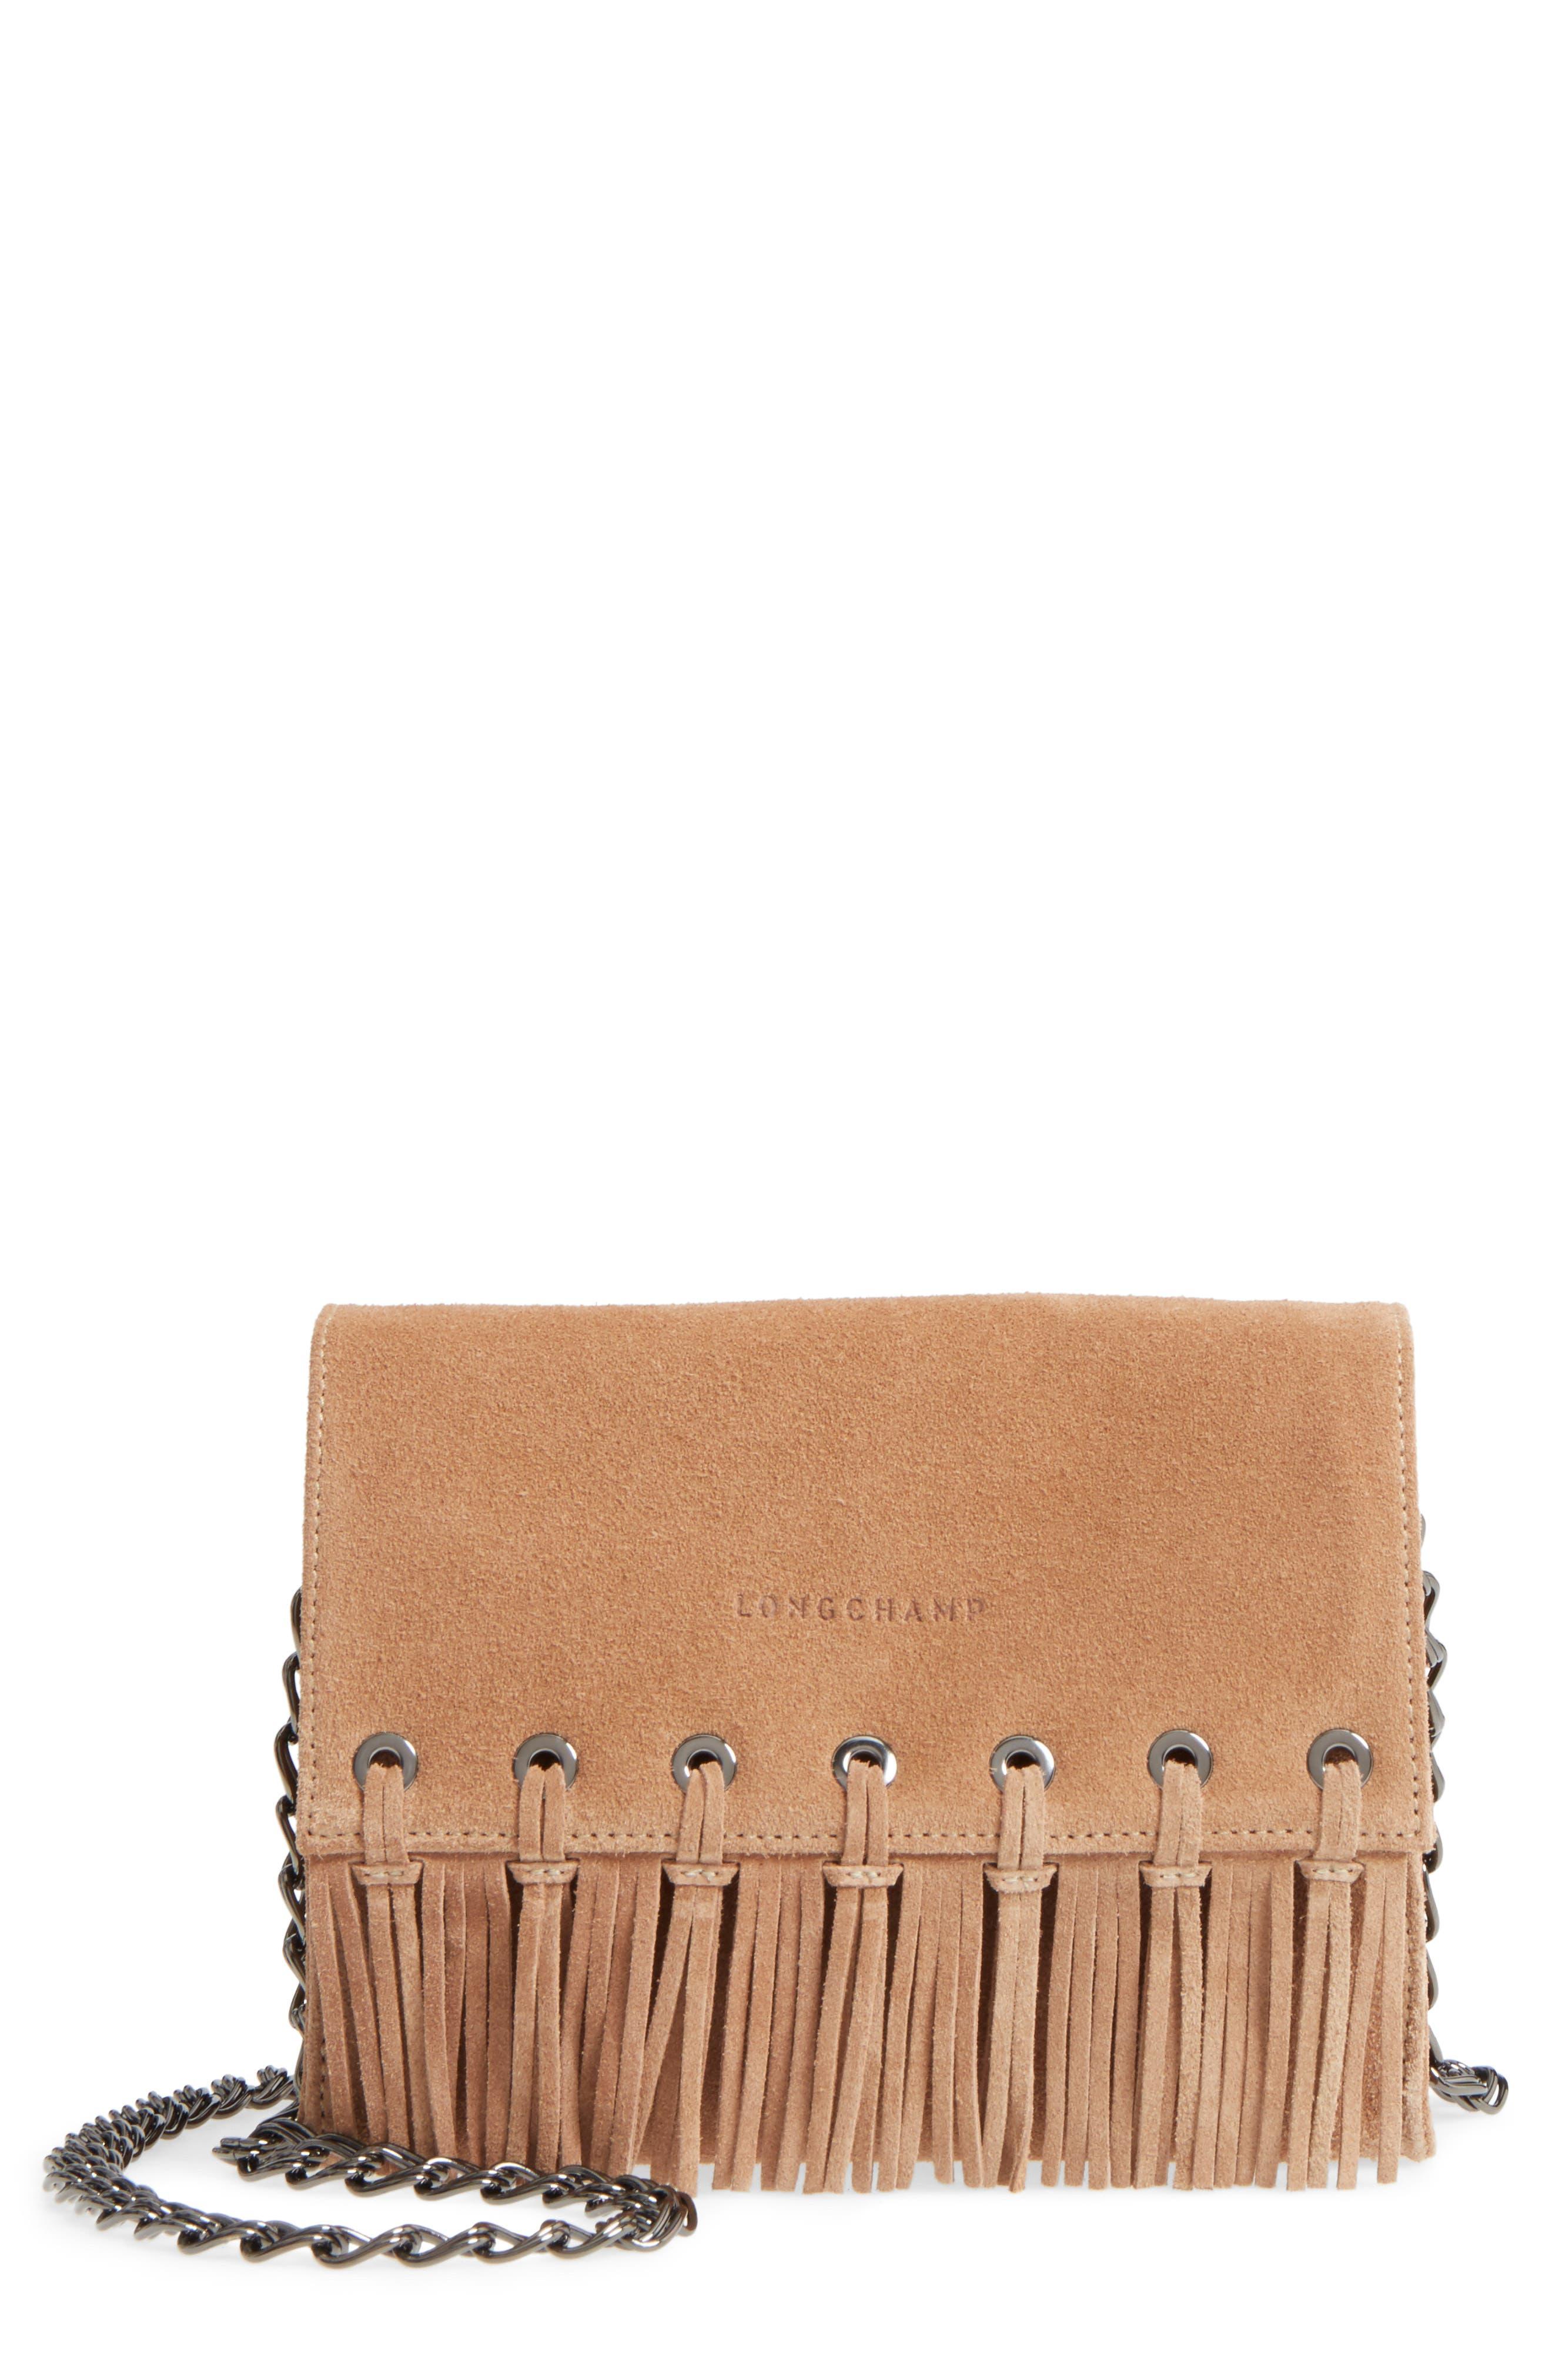 Alternate Image 1 Selected - Longchamp Paris Rocks Fringe Calfskin Suede Crossbody Bag